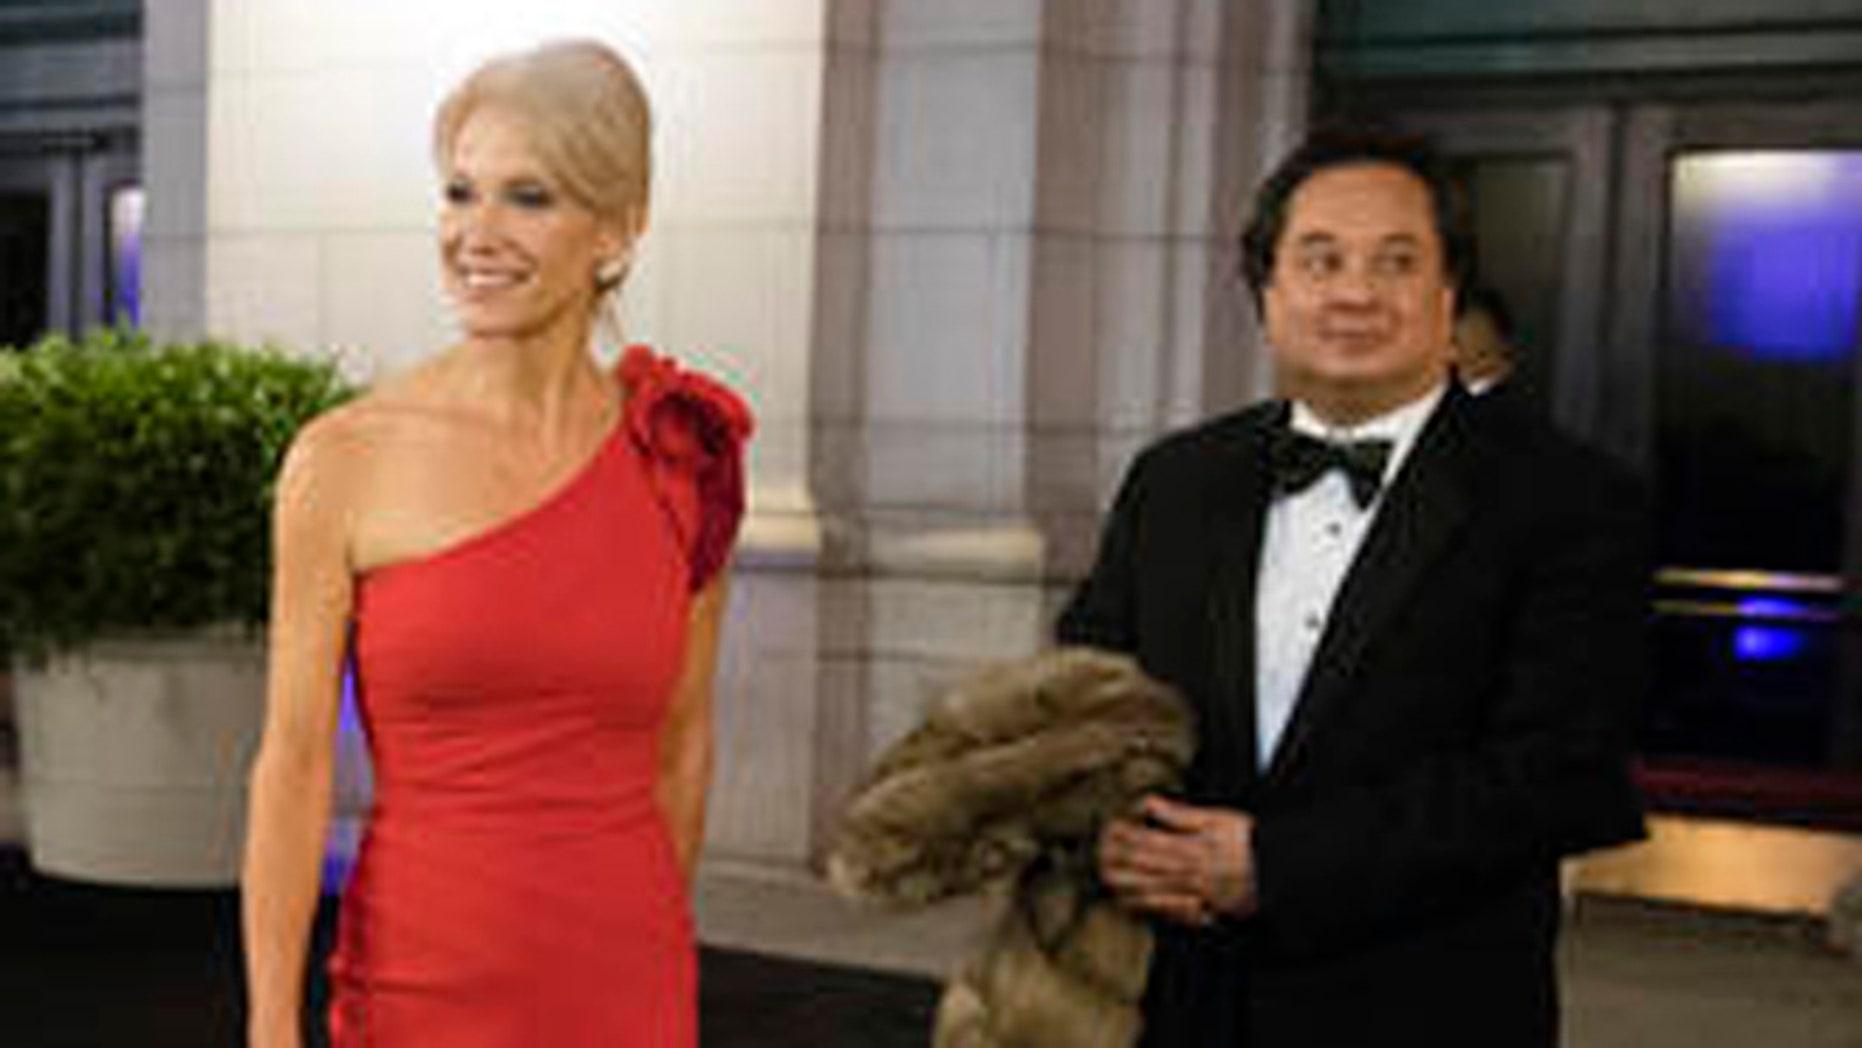 FILE: Jan. 19, 2017: President Trump adviser Kellyanne Conway and husband George Conway, Union Station, Washington, D.C. (Associated Press)